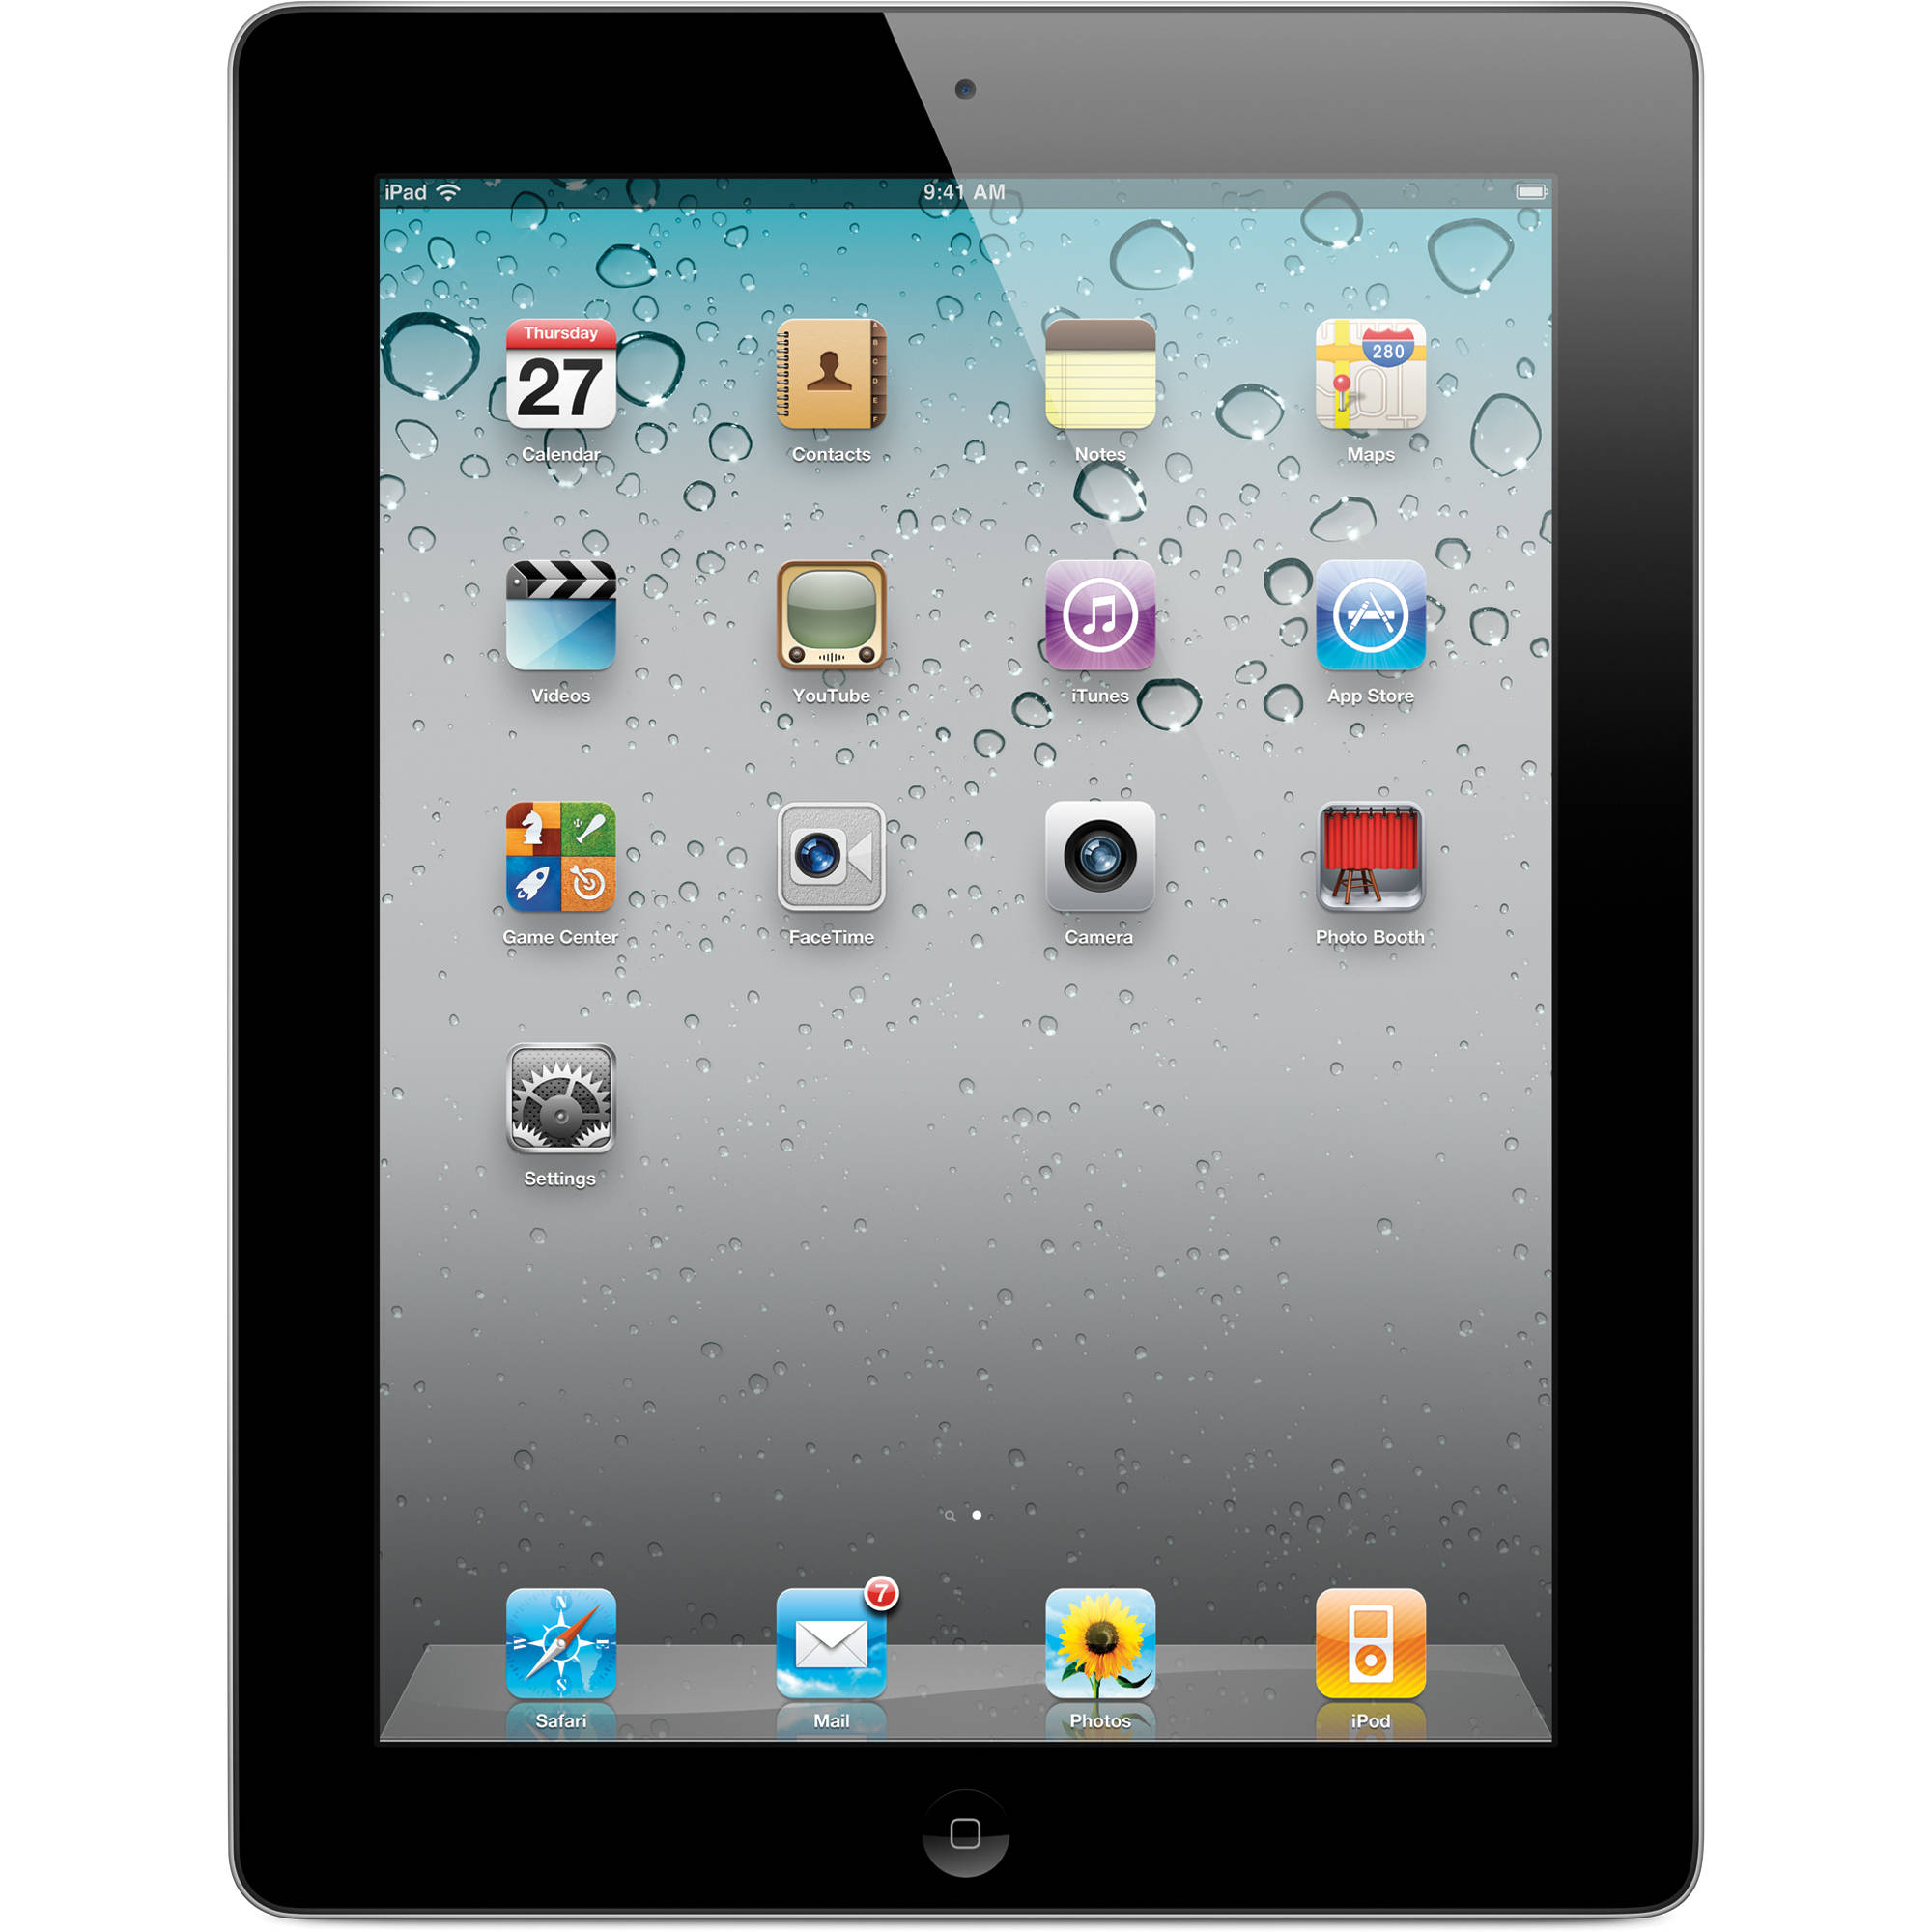 Apple iPad 2 16GB WiFi - Black